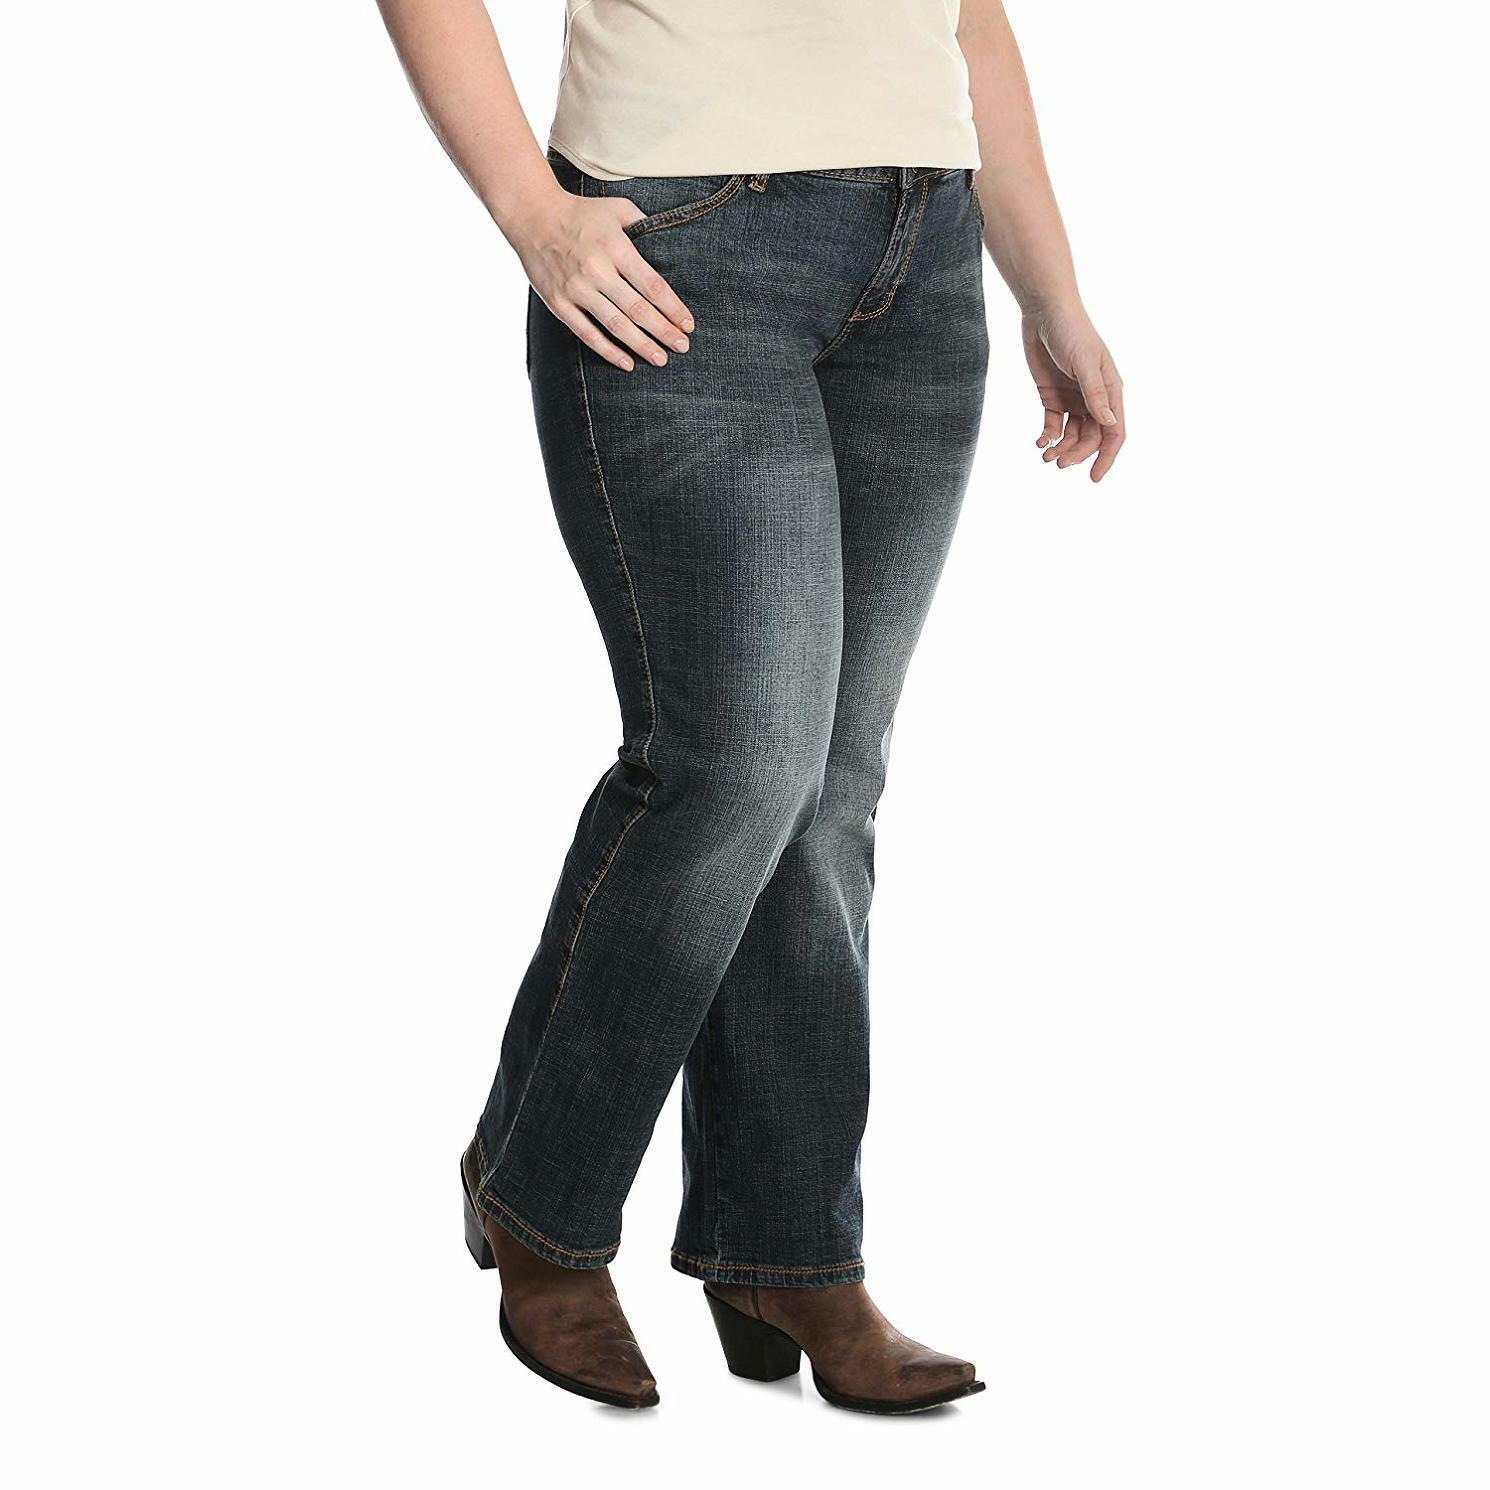 Wrangler Women's SZ Aura Plus Instantly Slimming Mid-Rise Jean